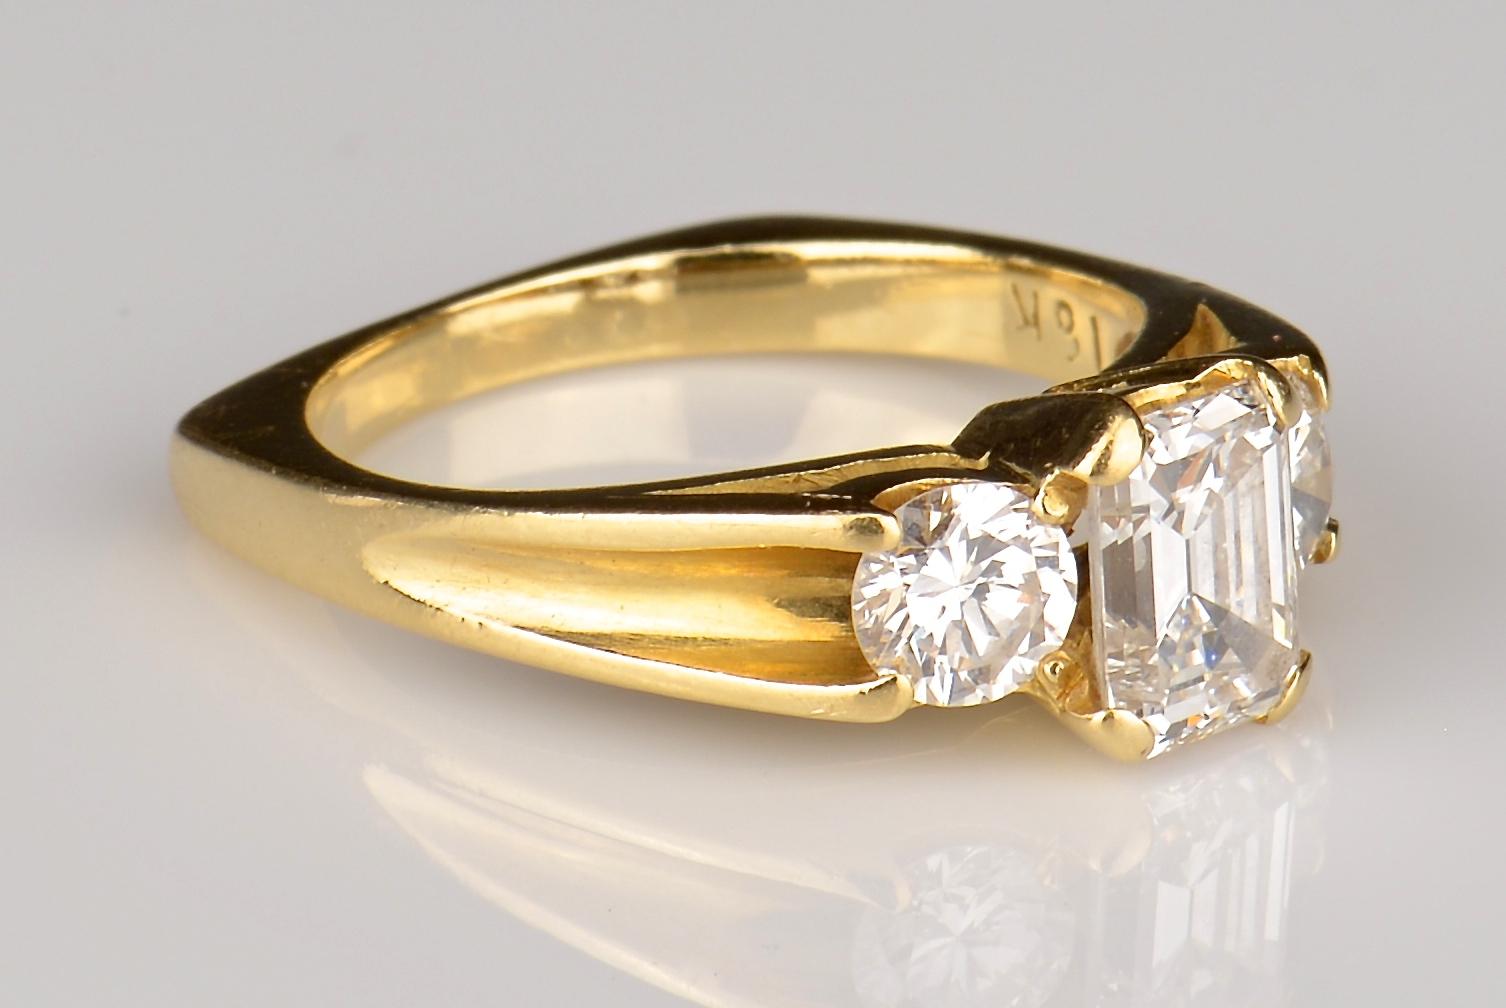 Lot 66: 18K 3-Stone Diamond Ring